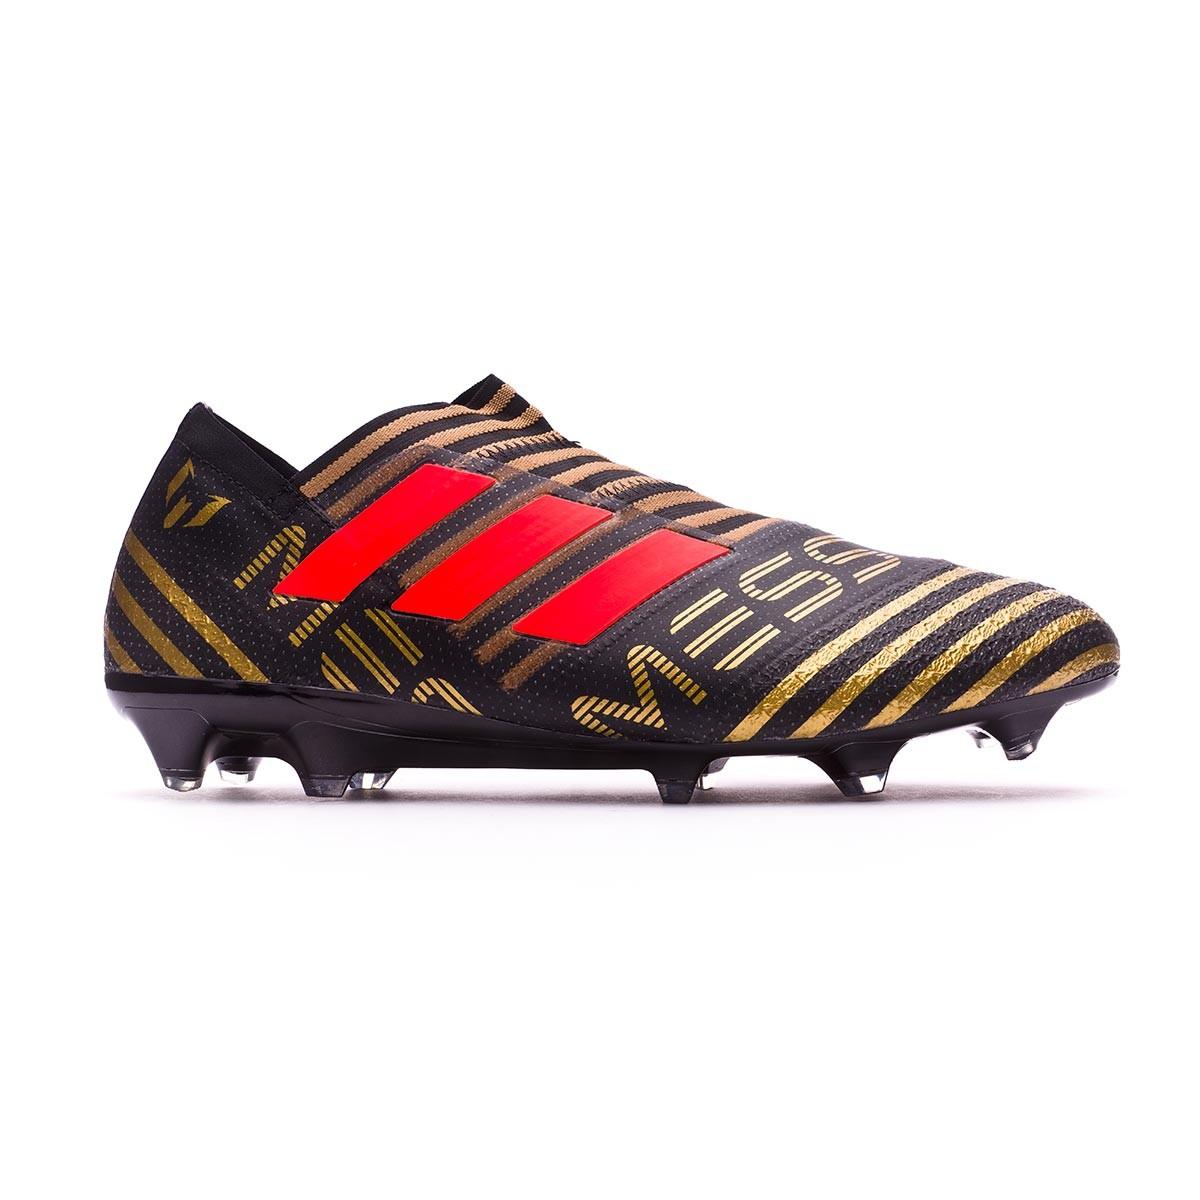 the latest 4d3e1 629a4 Boot adidas Nemeziz Messi 17+ 360 Agility FG Core black-Solar red-Tactile  gold metallic - Football store Fútbol Emotion